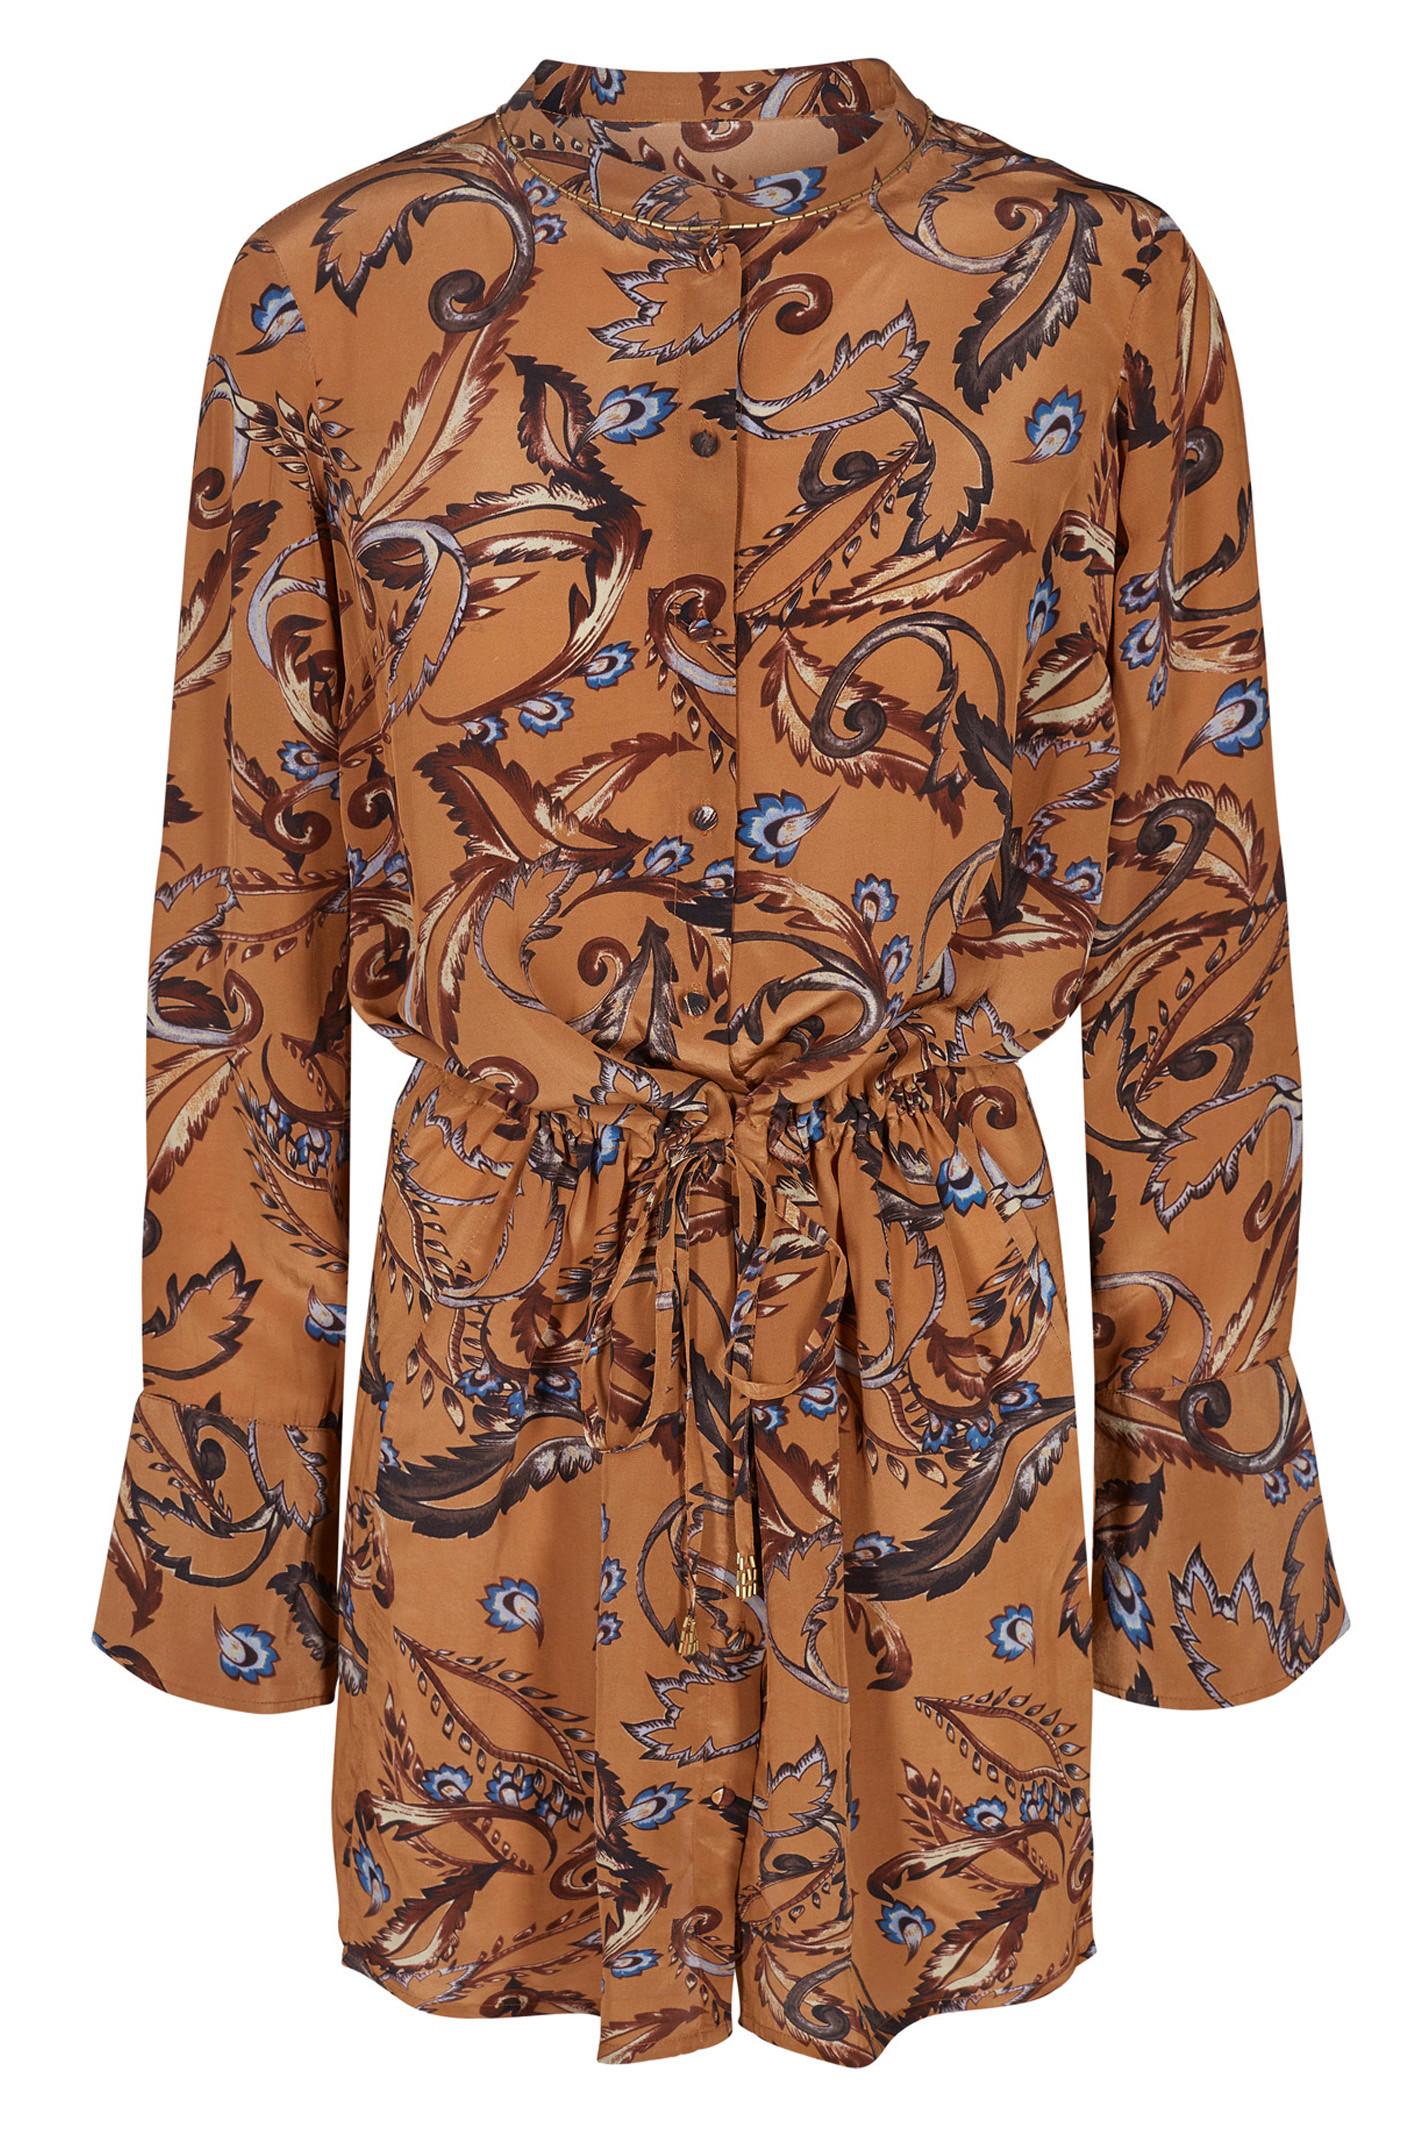 MOS MOSH MURIEL PIPA DRESS 125290 LYSEBRUN